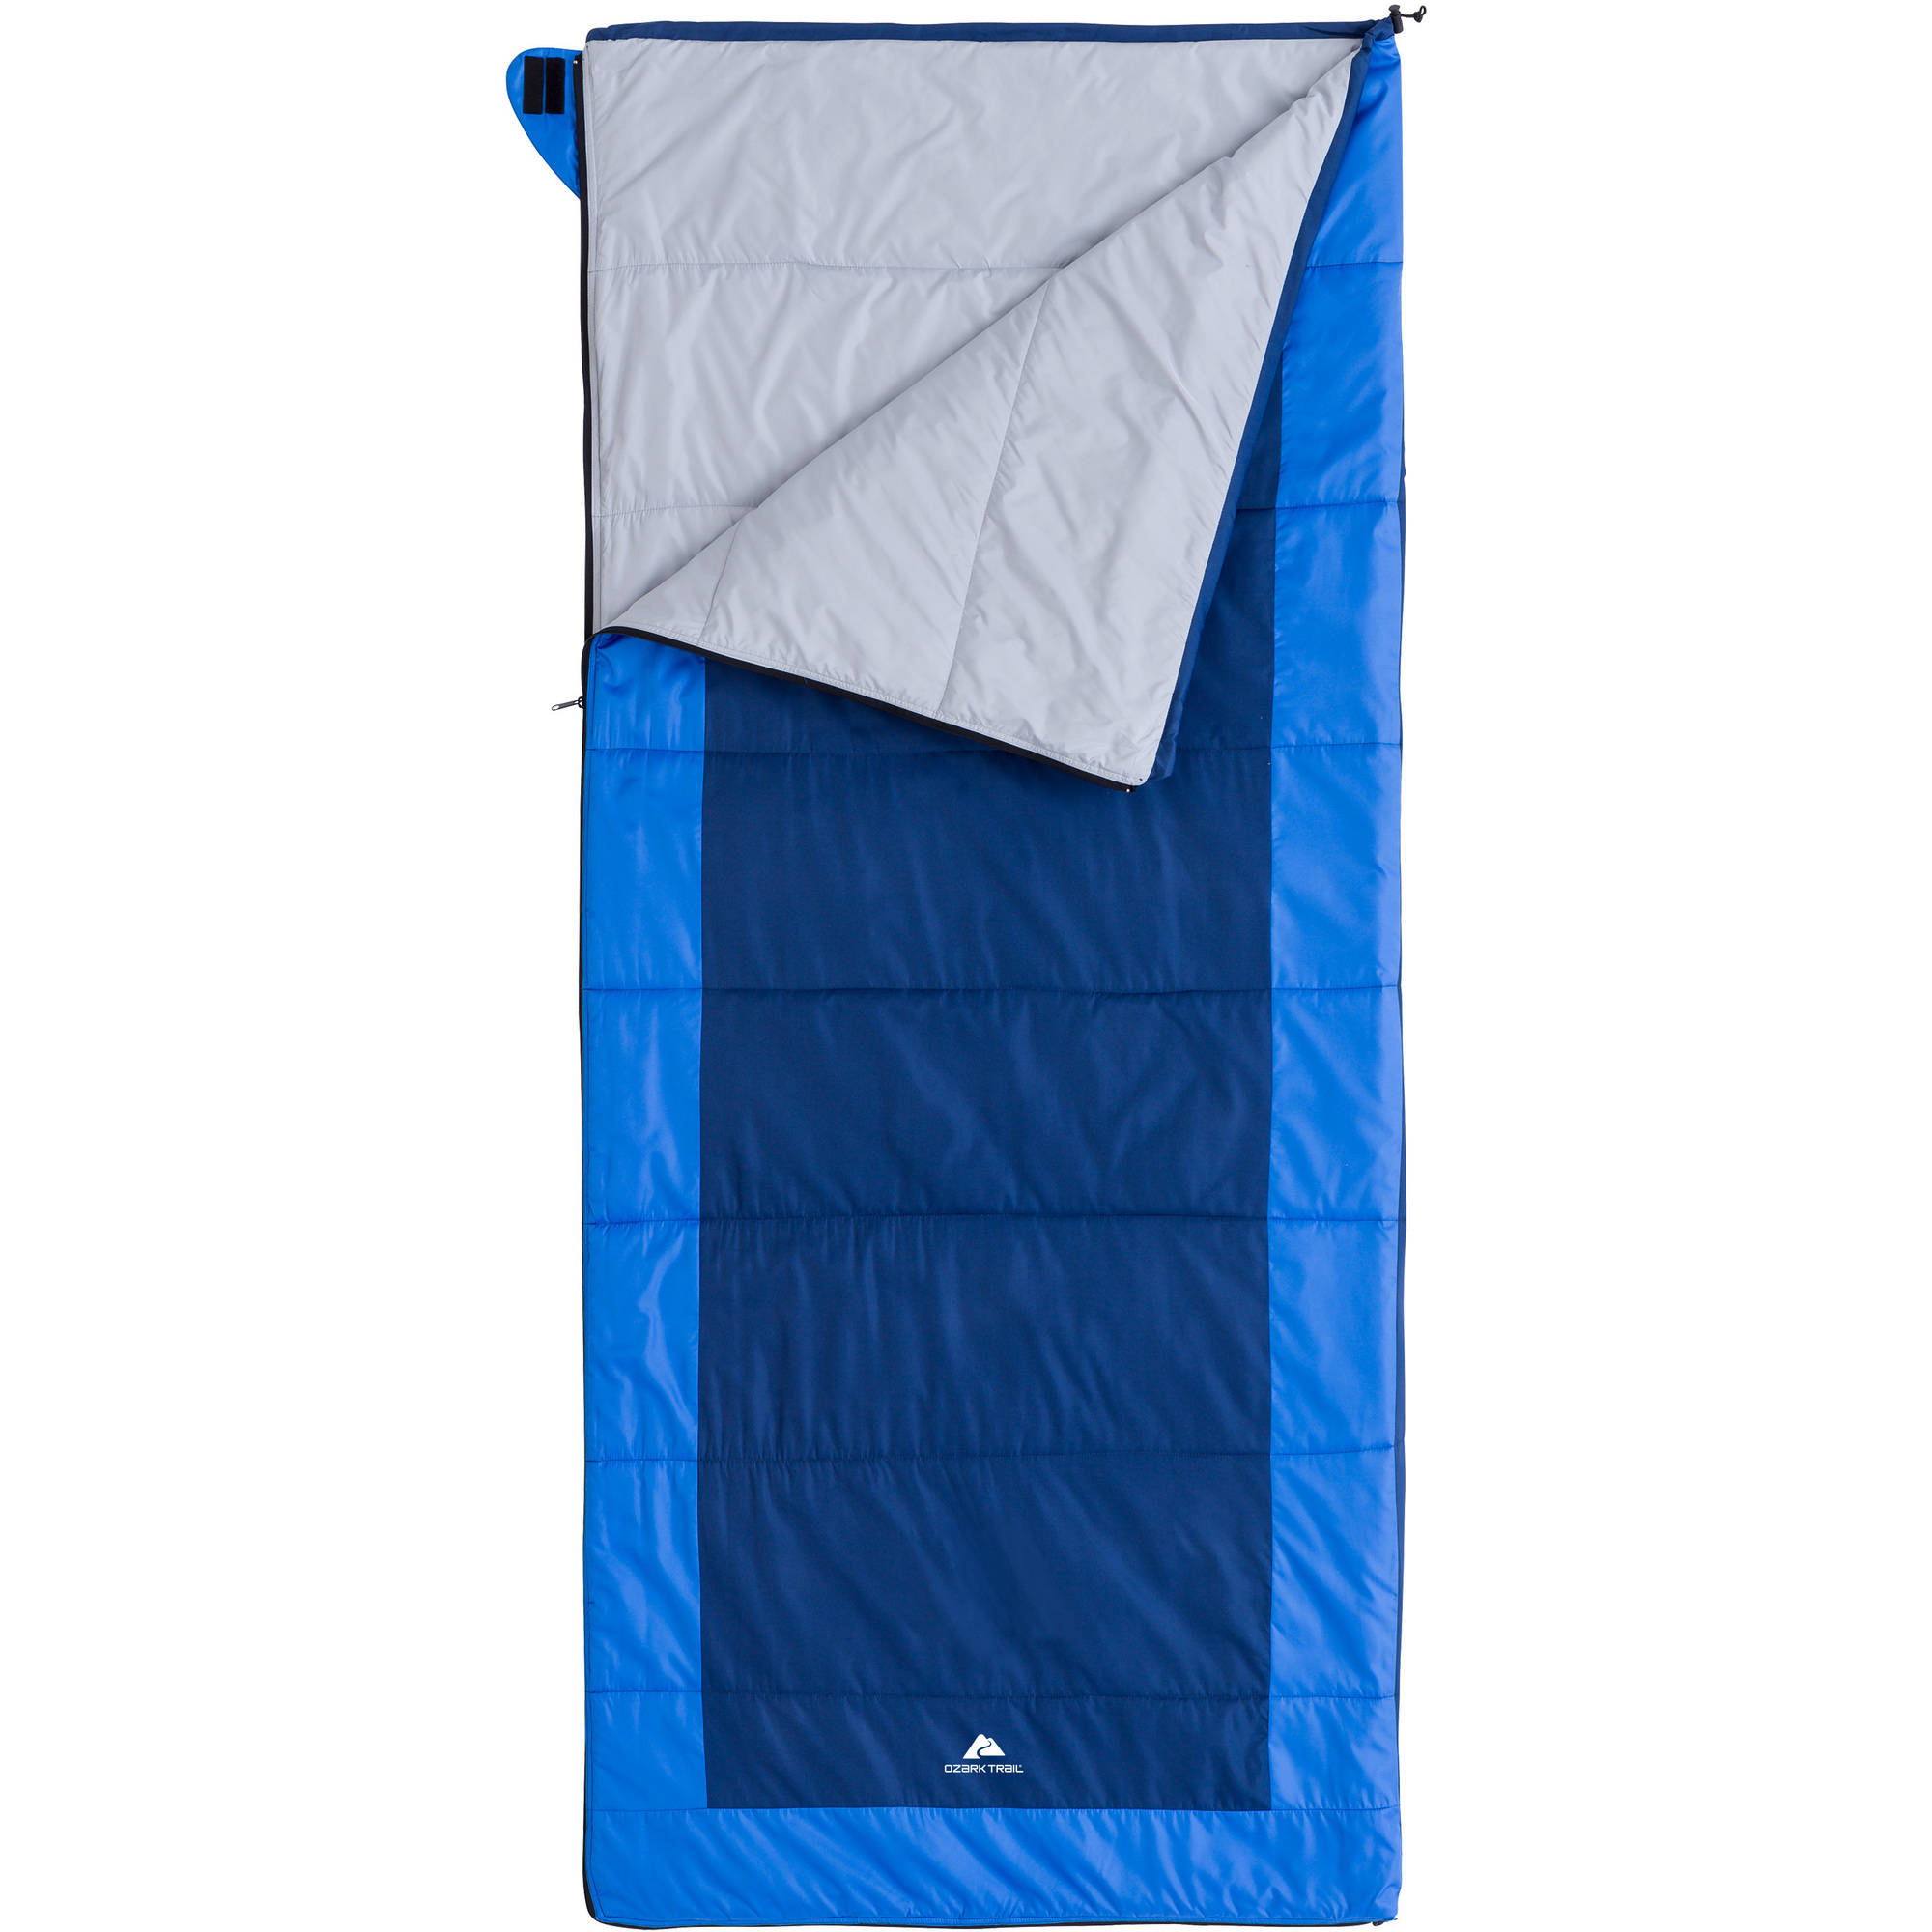 Ozark Trail 40F XL Climatech Rectangular Sleeping Bag by EUSEBIO SPORTING CO.,LTD